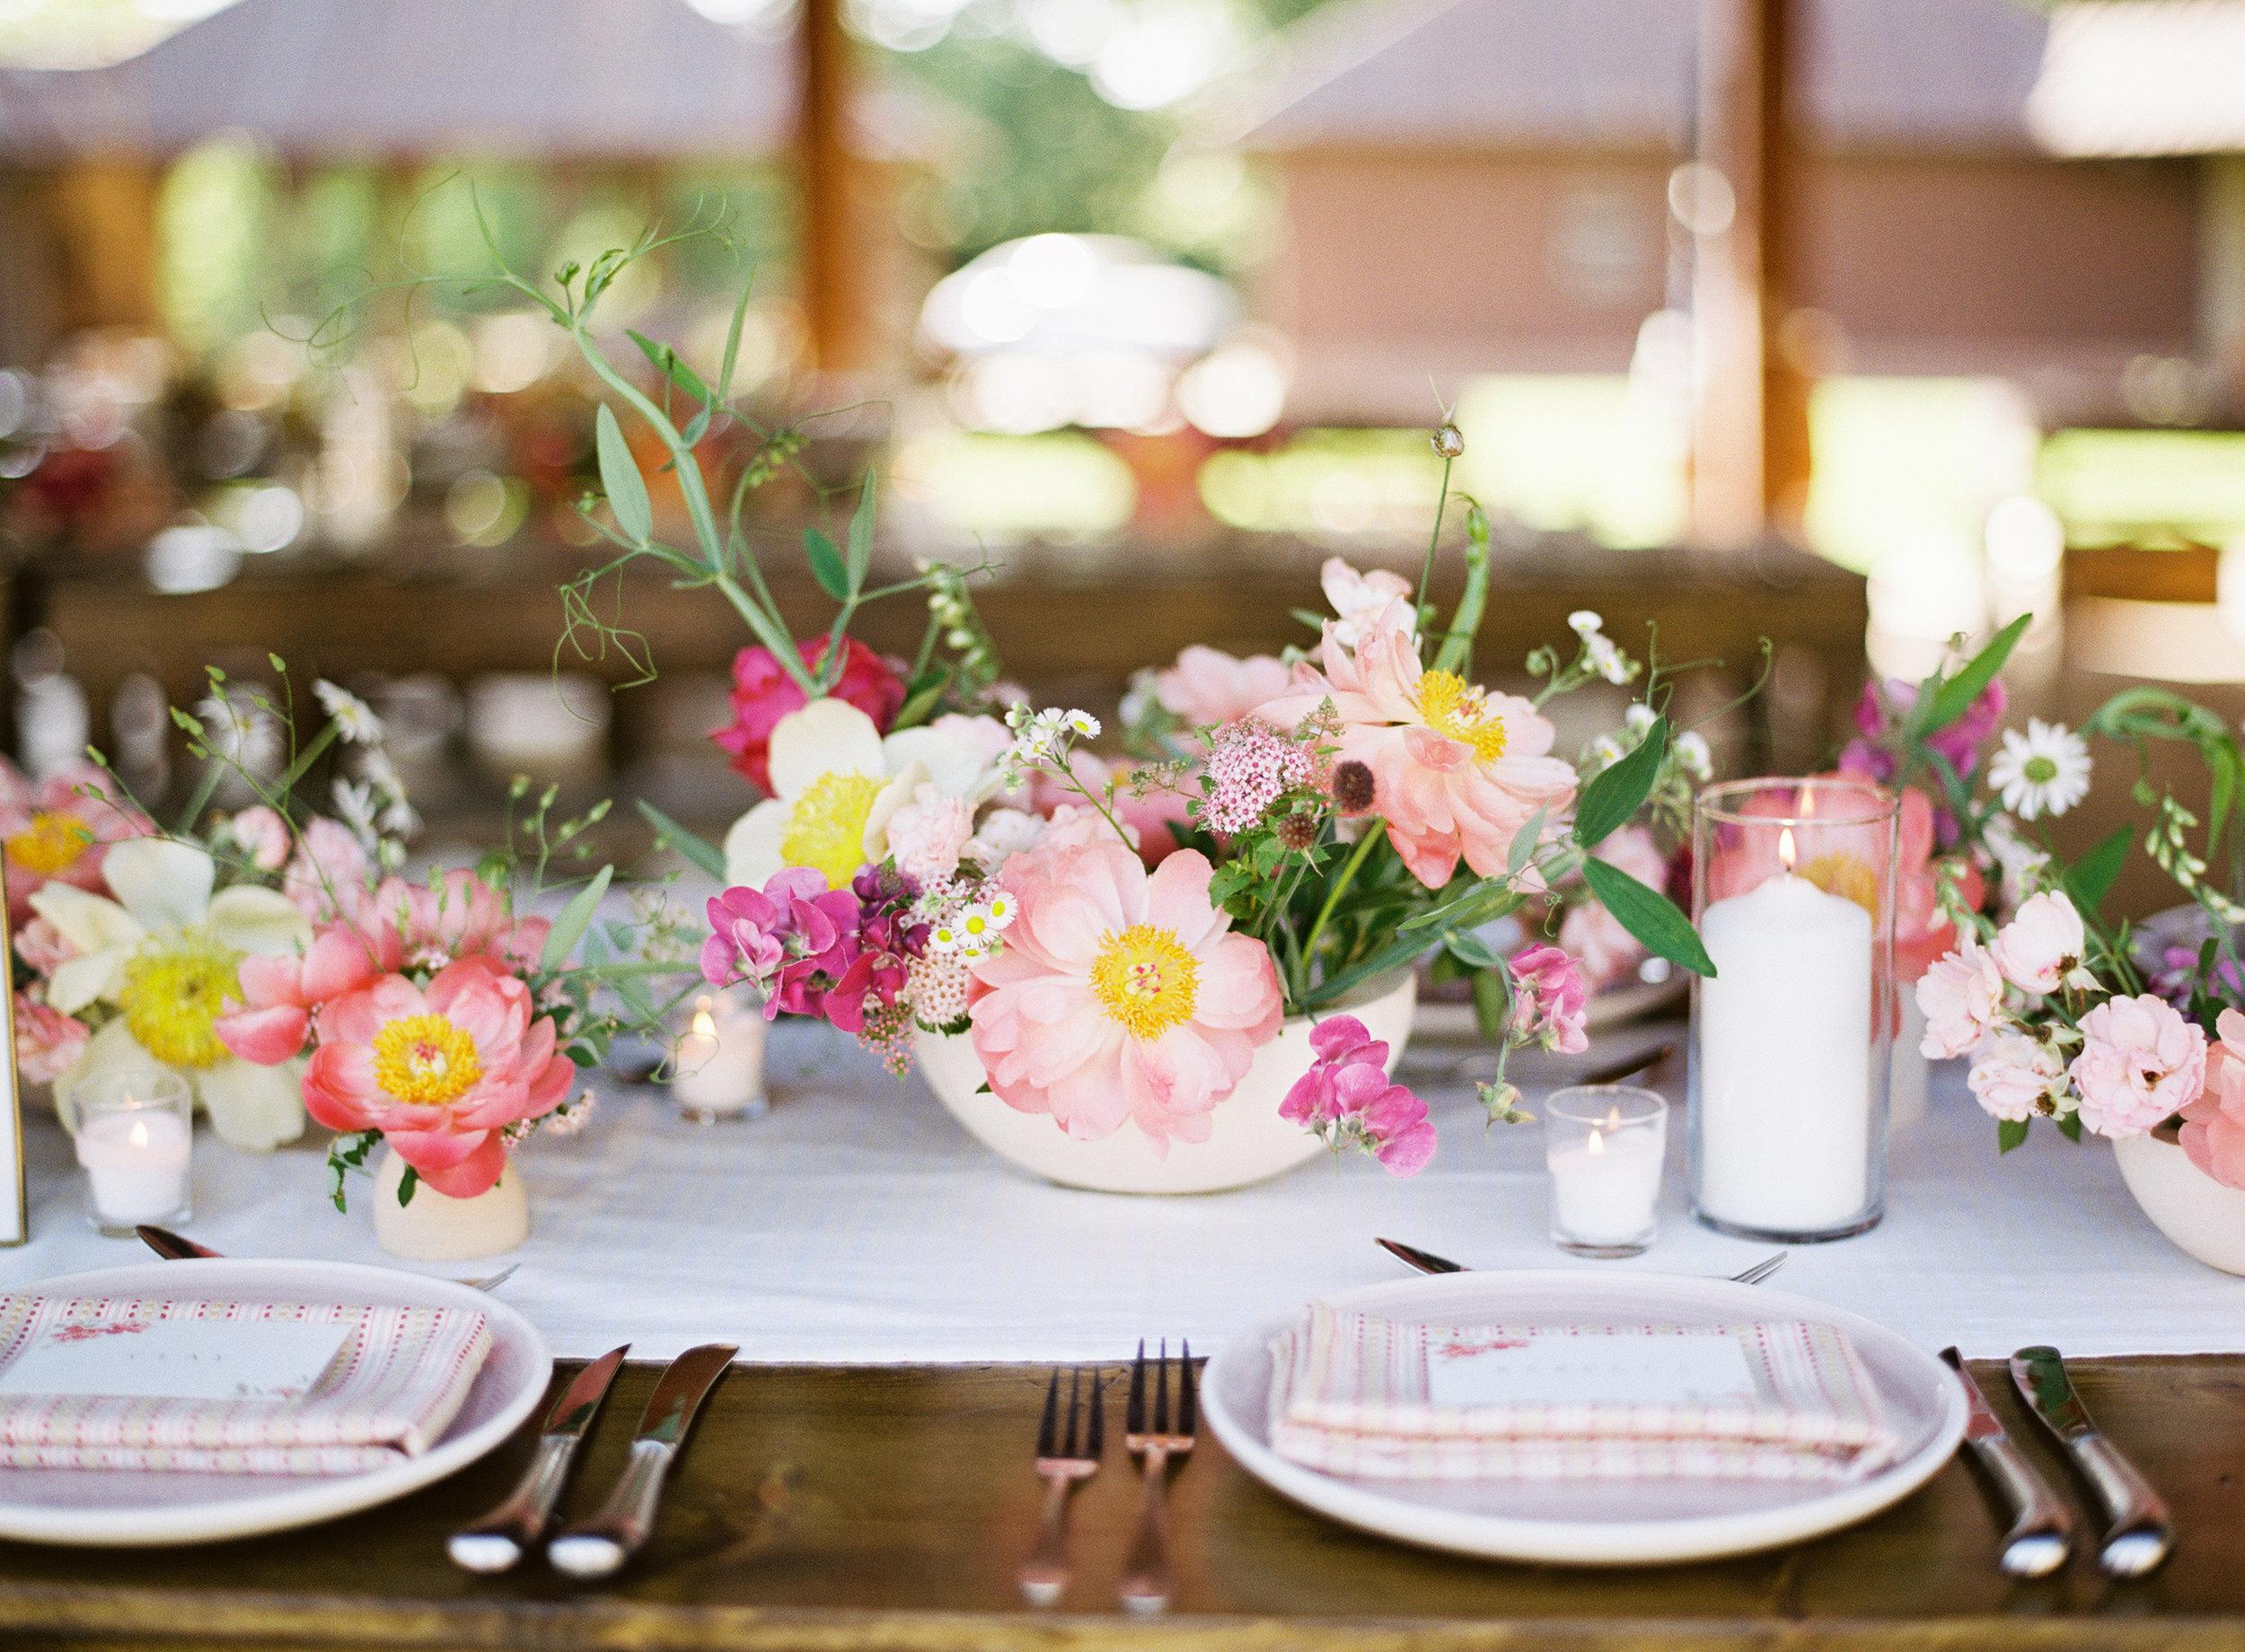 bbq-rehearsal-dinner-asheville-north-carolina-wedding-martha-stewart-weddings-the-wildflowers-dallas-wedding-planner